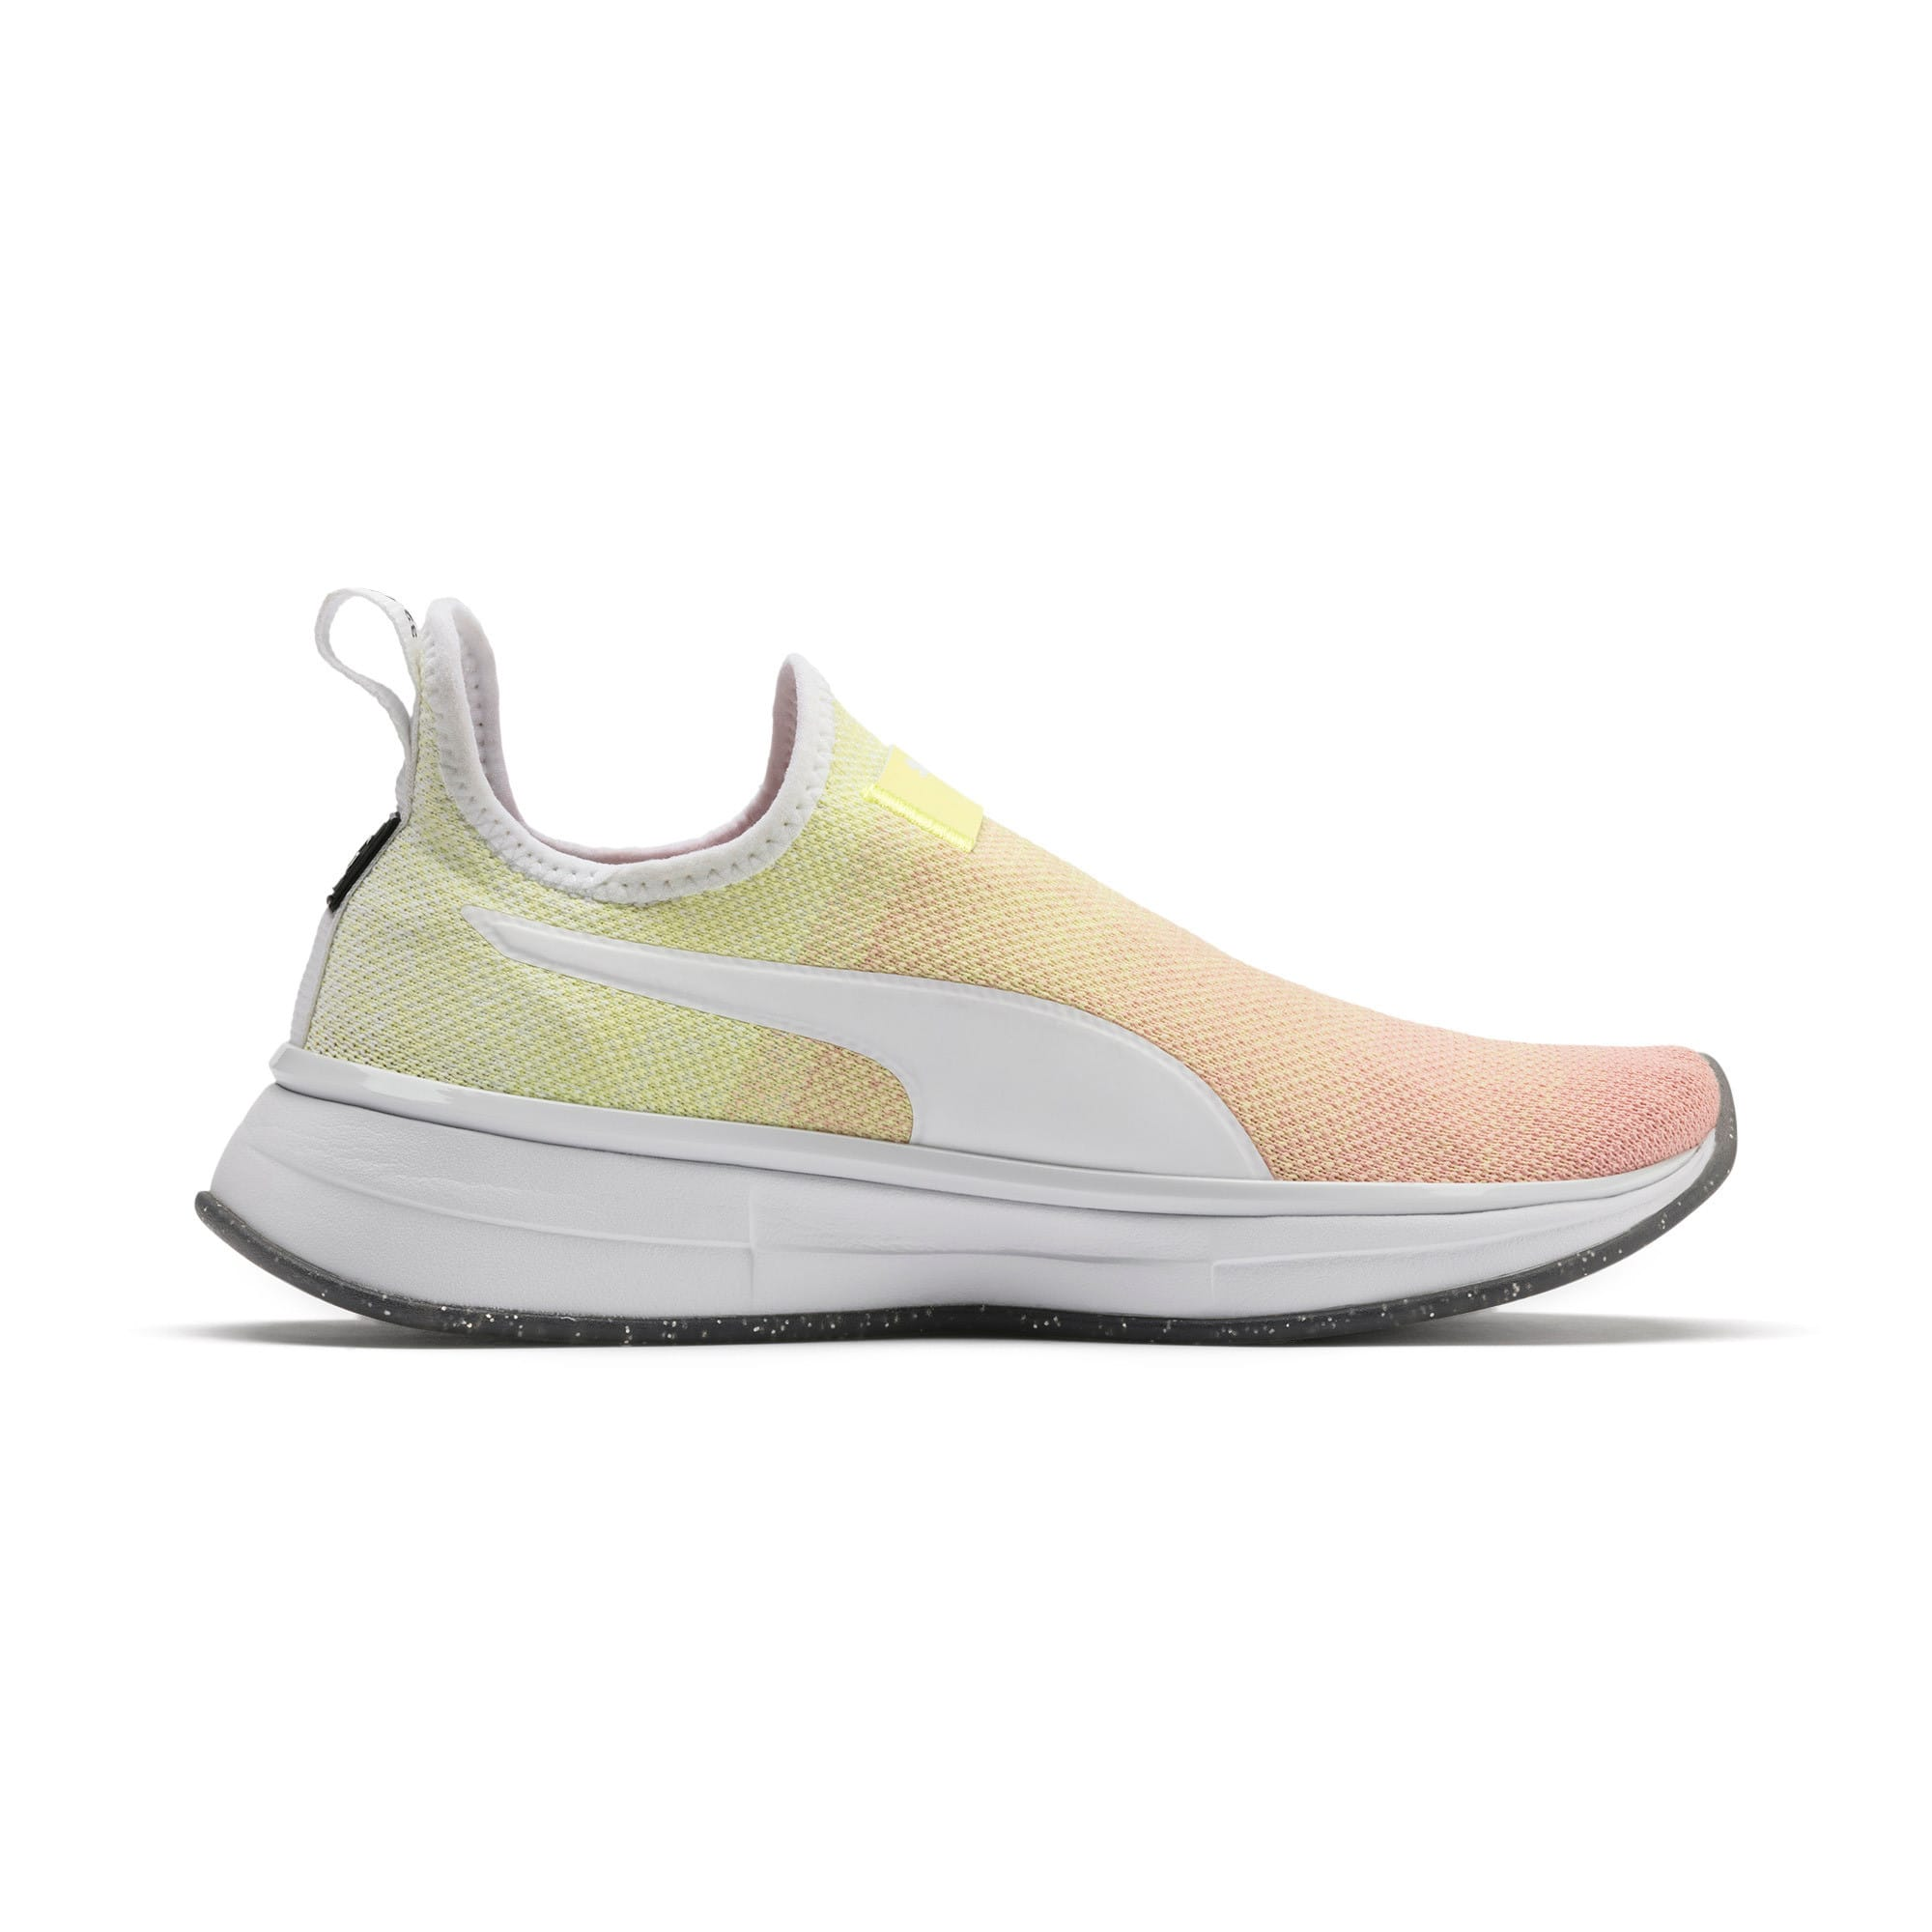 Thumbnail 6 of SG Slip-On Sunrise Women's Training Shoes, YELLOW-Peach Bud-White, medium